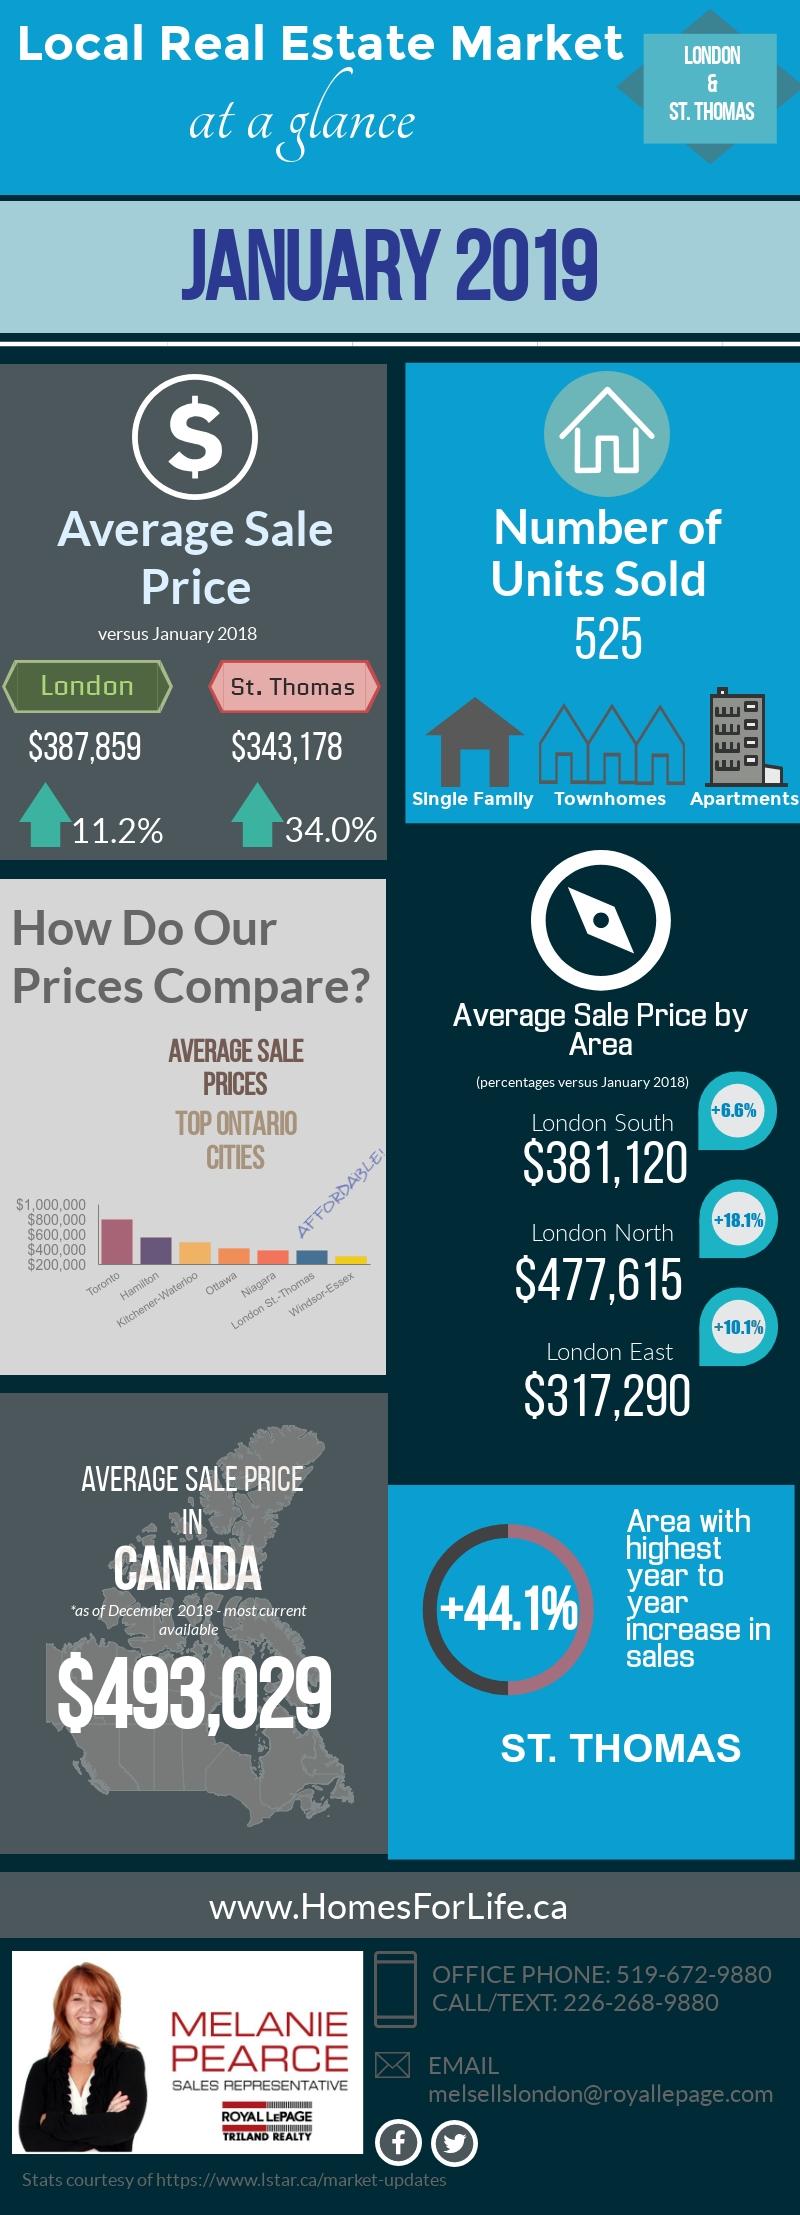 London-Ontario-Real-Estate-Market-Stats-January 2019.jpg